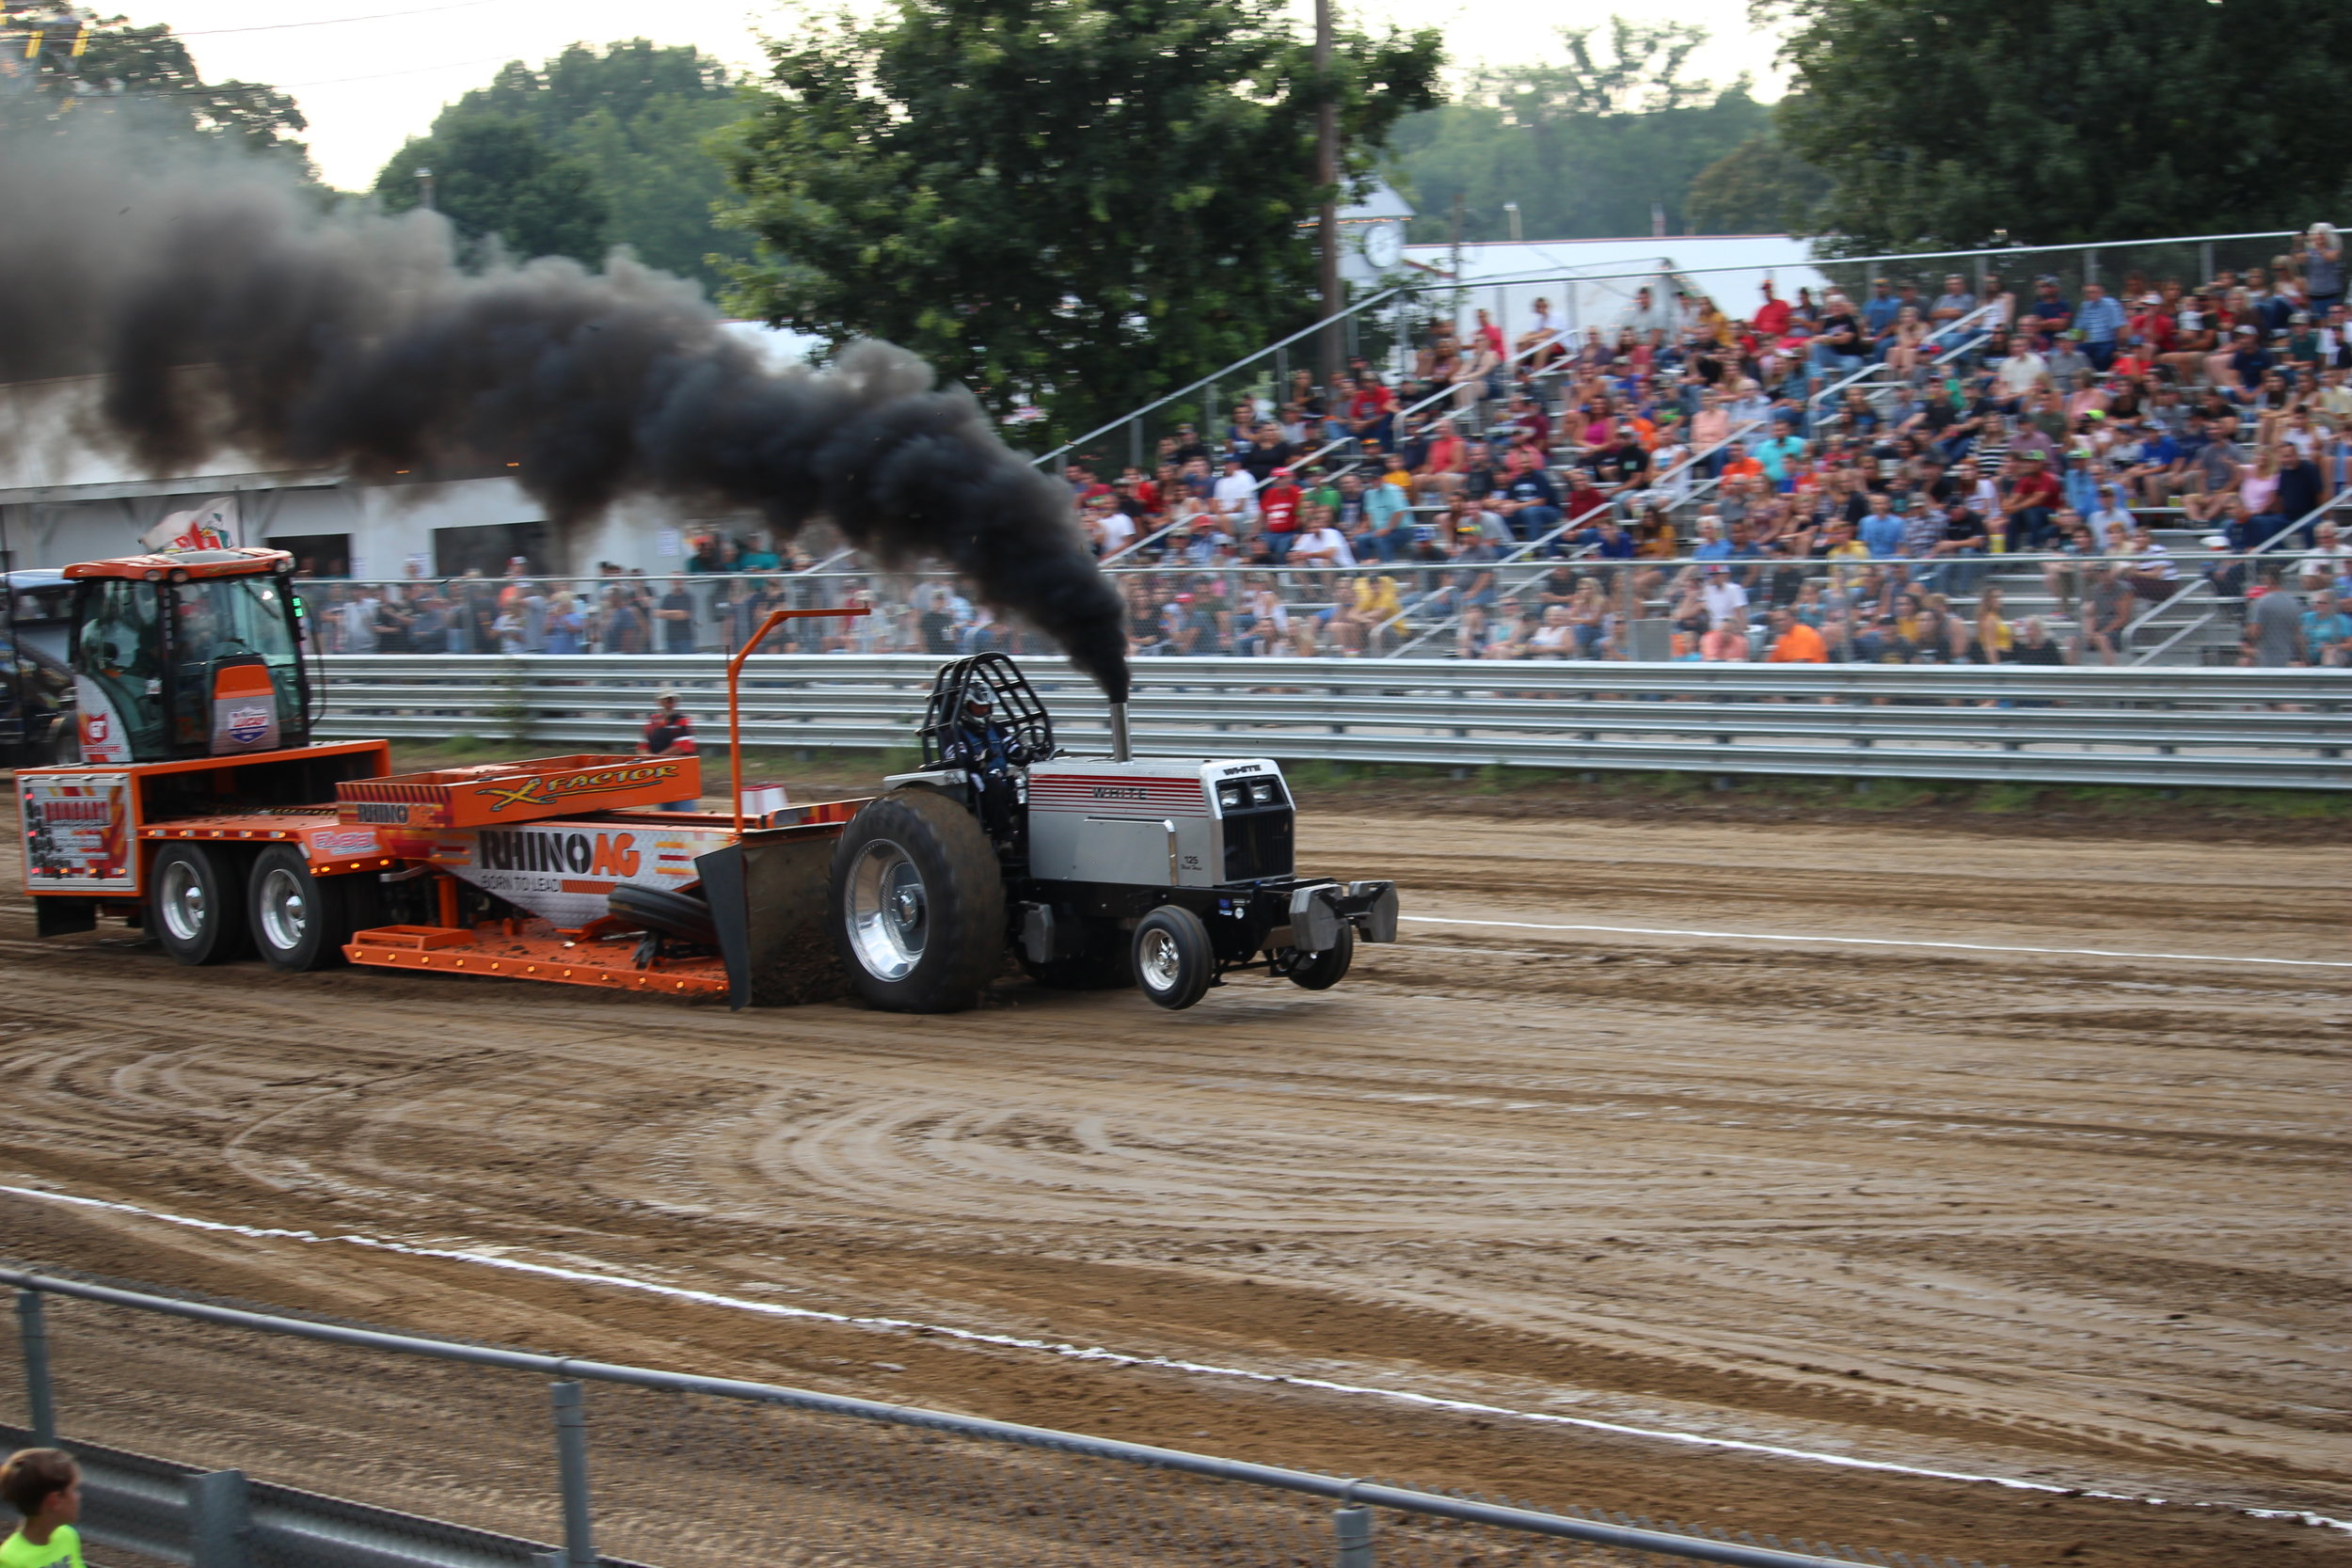 tractor pull 4.JPG